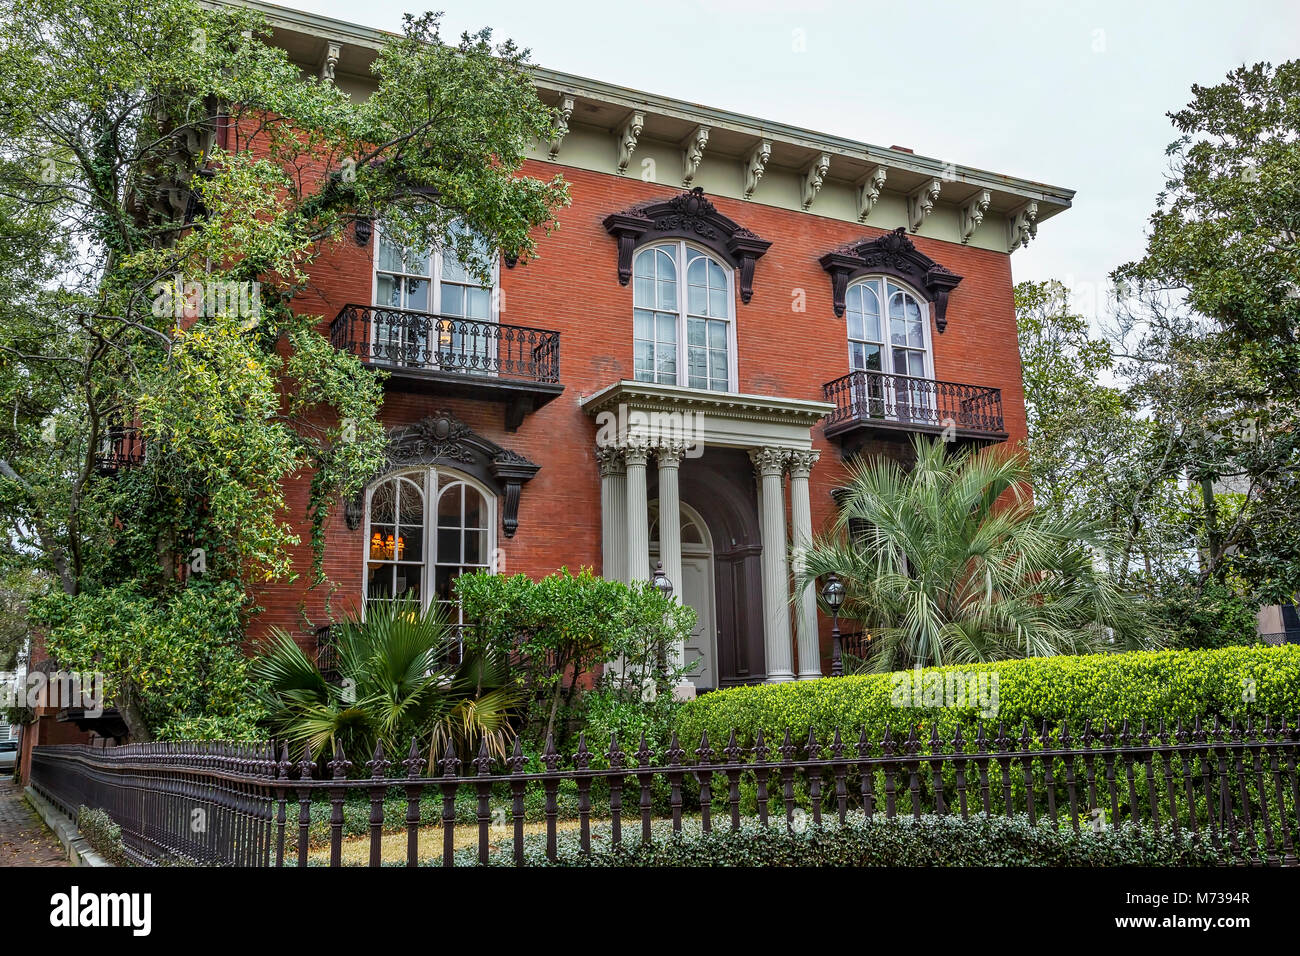 The Mercer Williams house museum in Savannah, Georgia - Stock Image